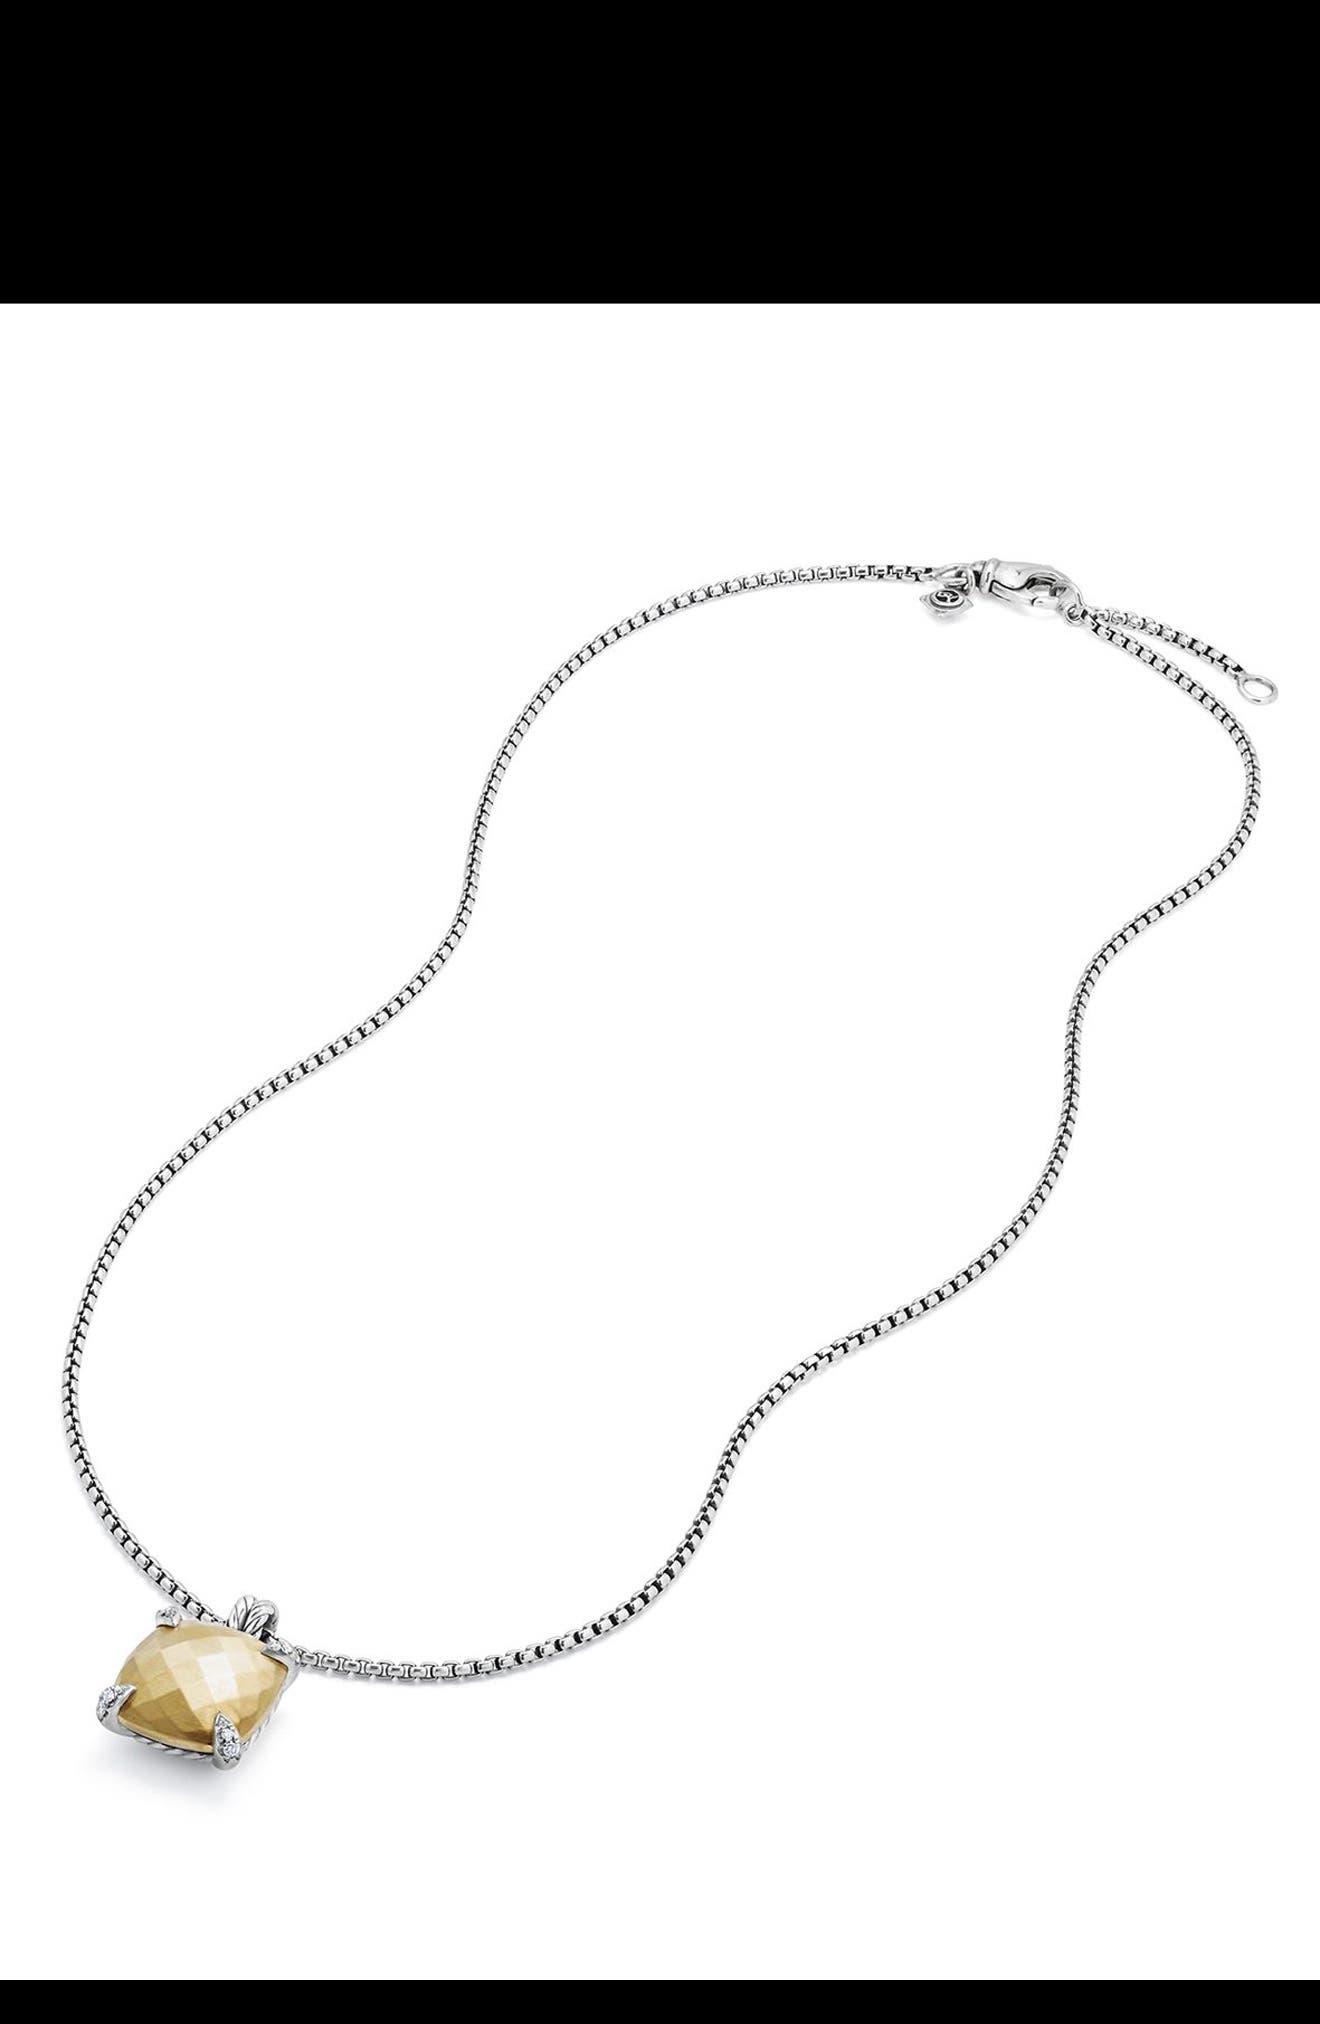 Main Image - David Yurman Châtelaine Pendant Necklace with Diamonds